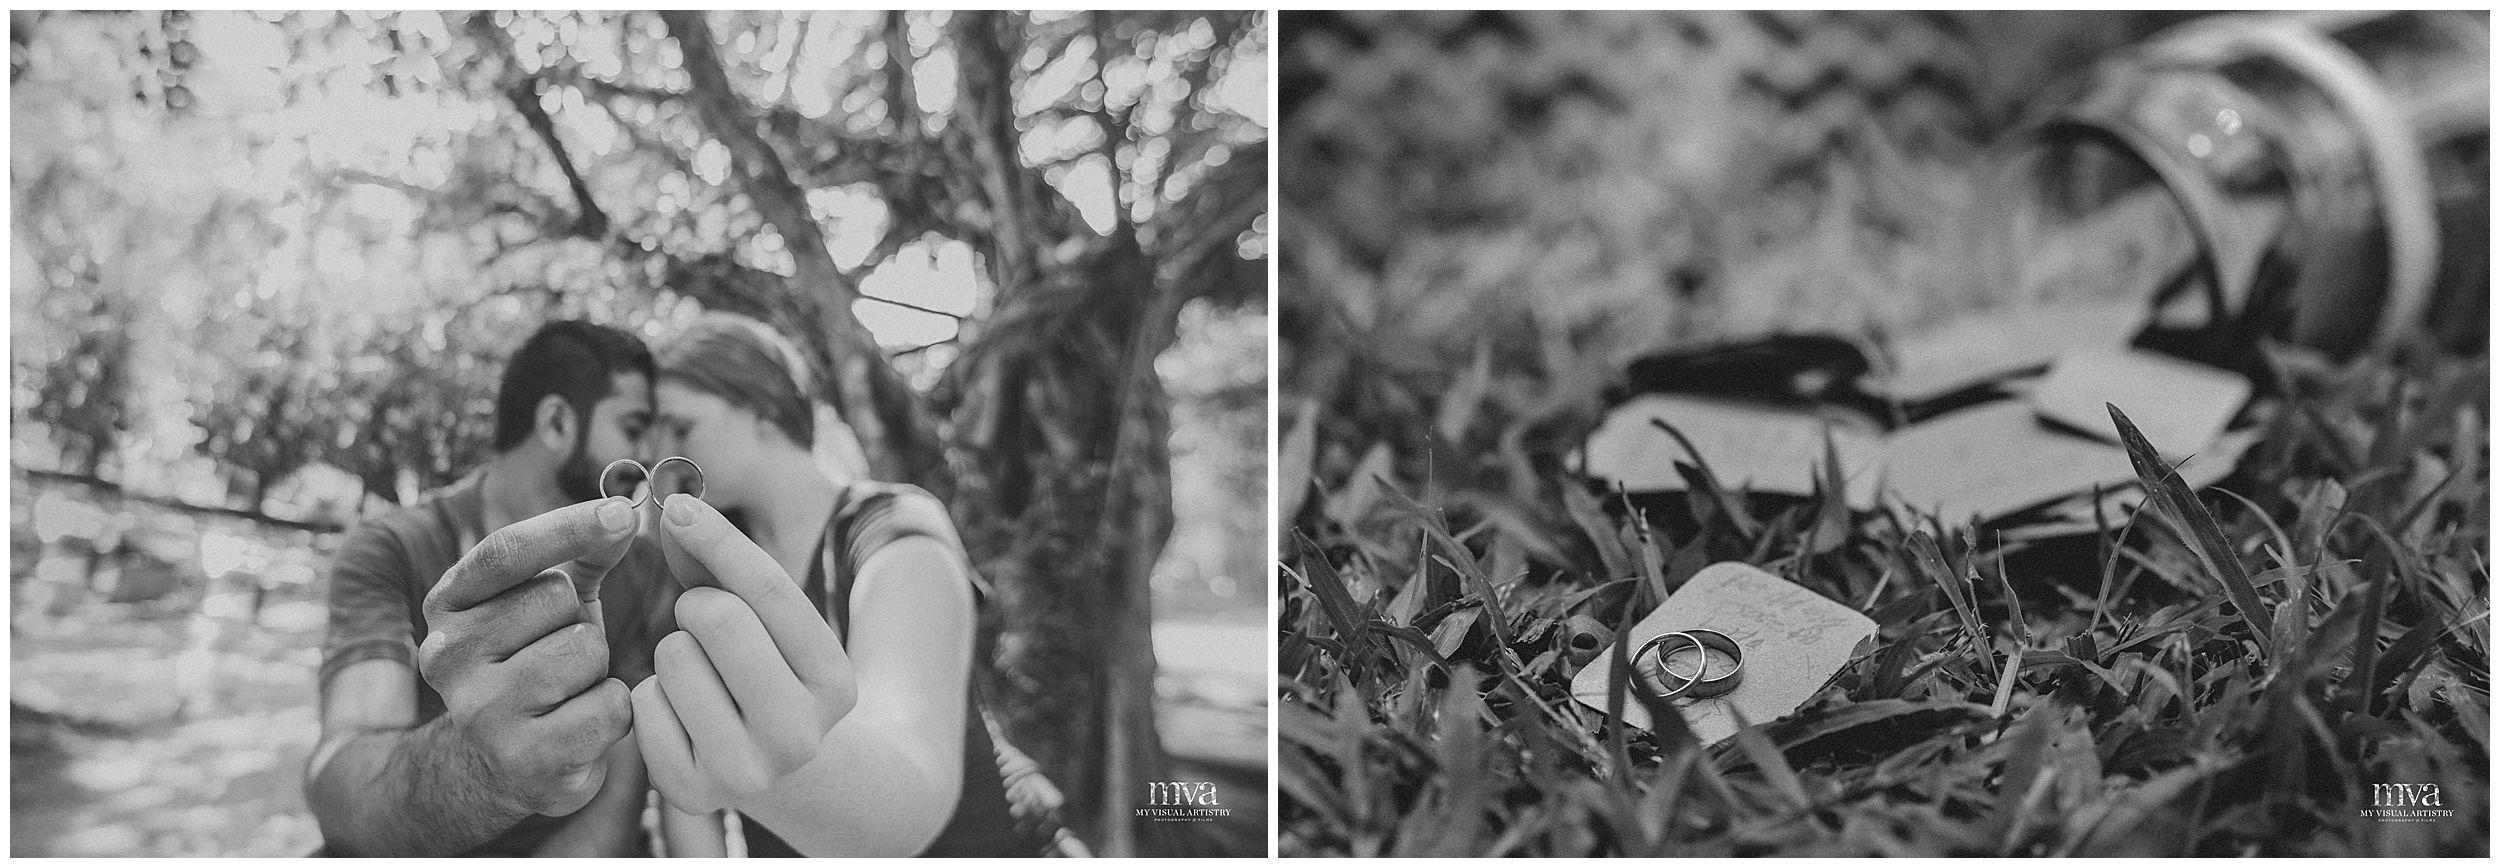 JOSEPH_LIDIA_MYVISUALARTISTRY_POLAND_WEDDING_PHOTOGRAPHER_MVA_JAIPUR_KERALA_MUNNAR_COCHIN_0009.jpg